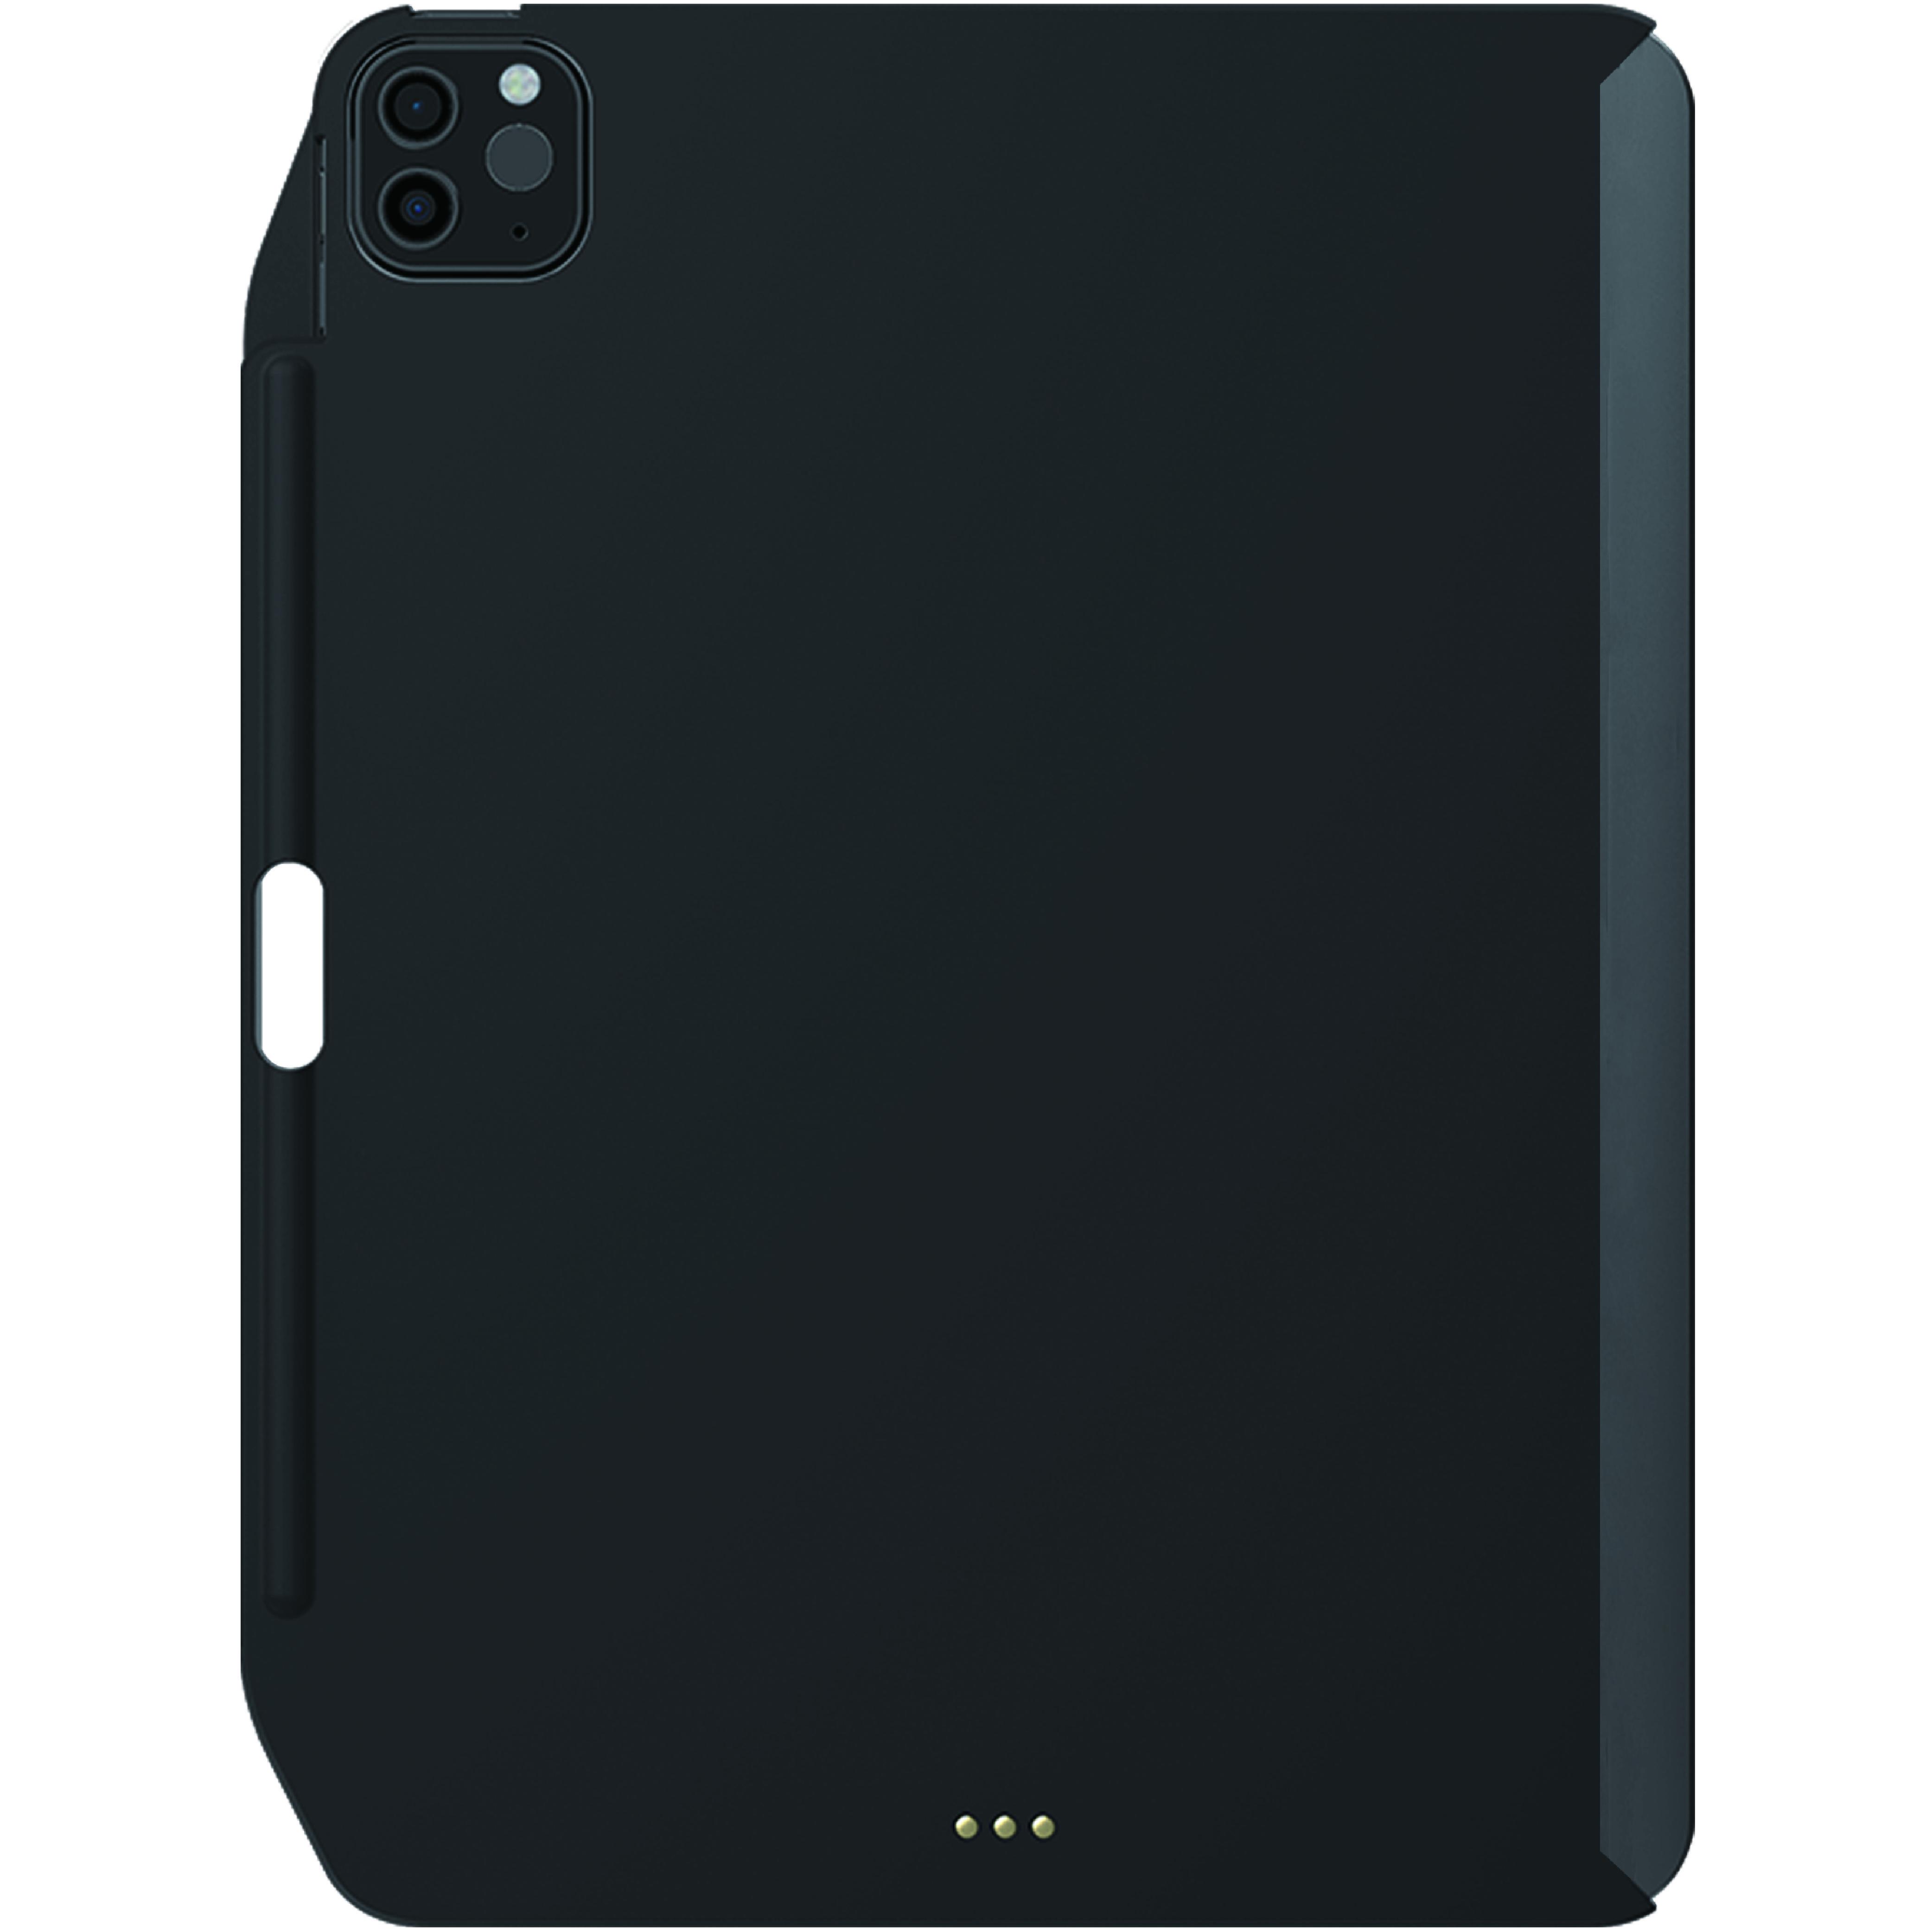 Ốp CoverBuddy iPad Pro 12.9 inch 2020 SwitchEasy